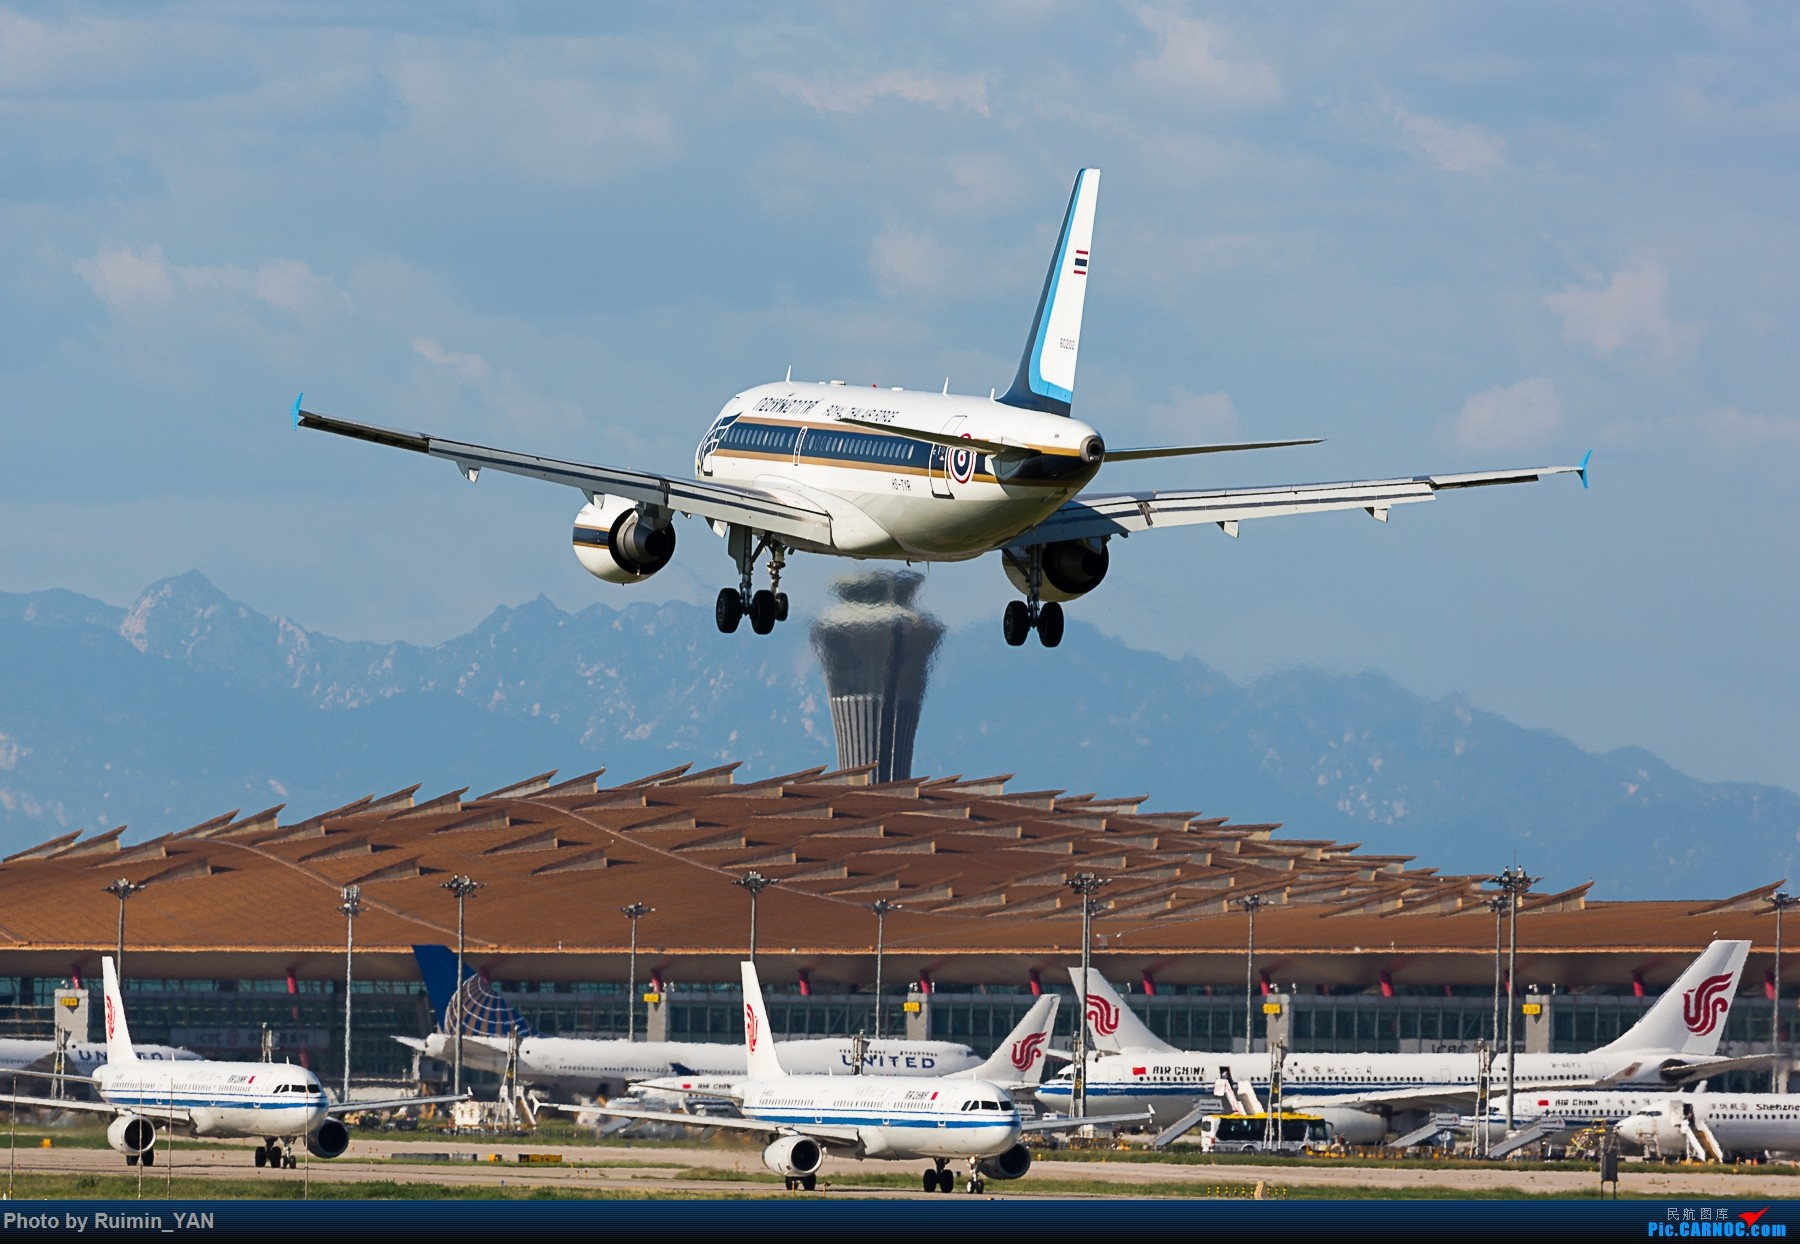 Re:【PEK】【砖机】泰国副总理兼国防部长巴维访华 泰国皇家空军(RTAF, Royal Thai Air Force) HS-TYR A319CJ AIRBUS A319-115CJ HS-TYR 中国北京首都国际机场